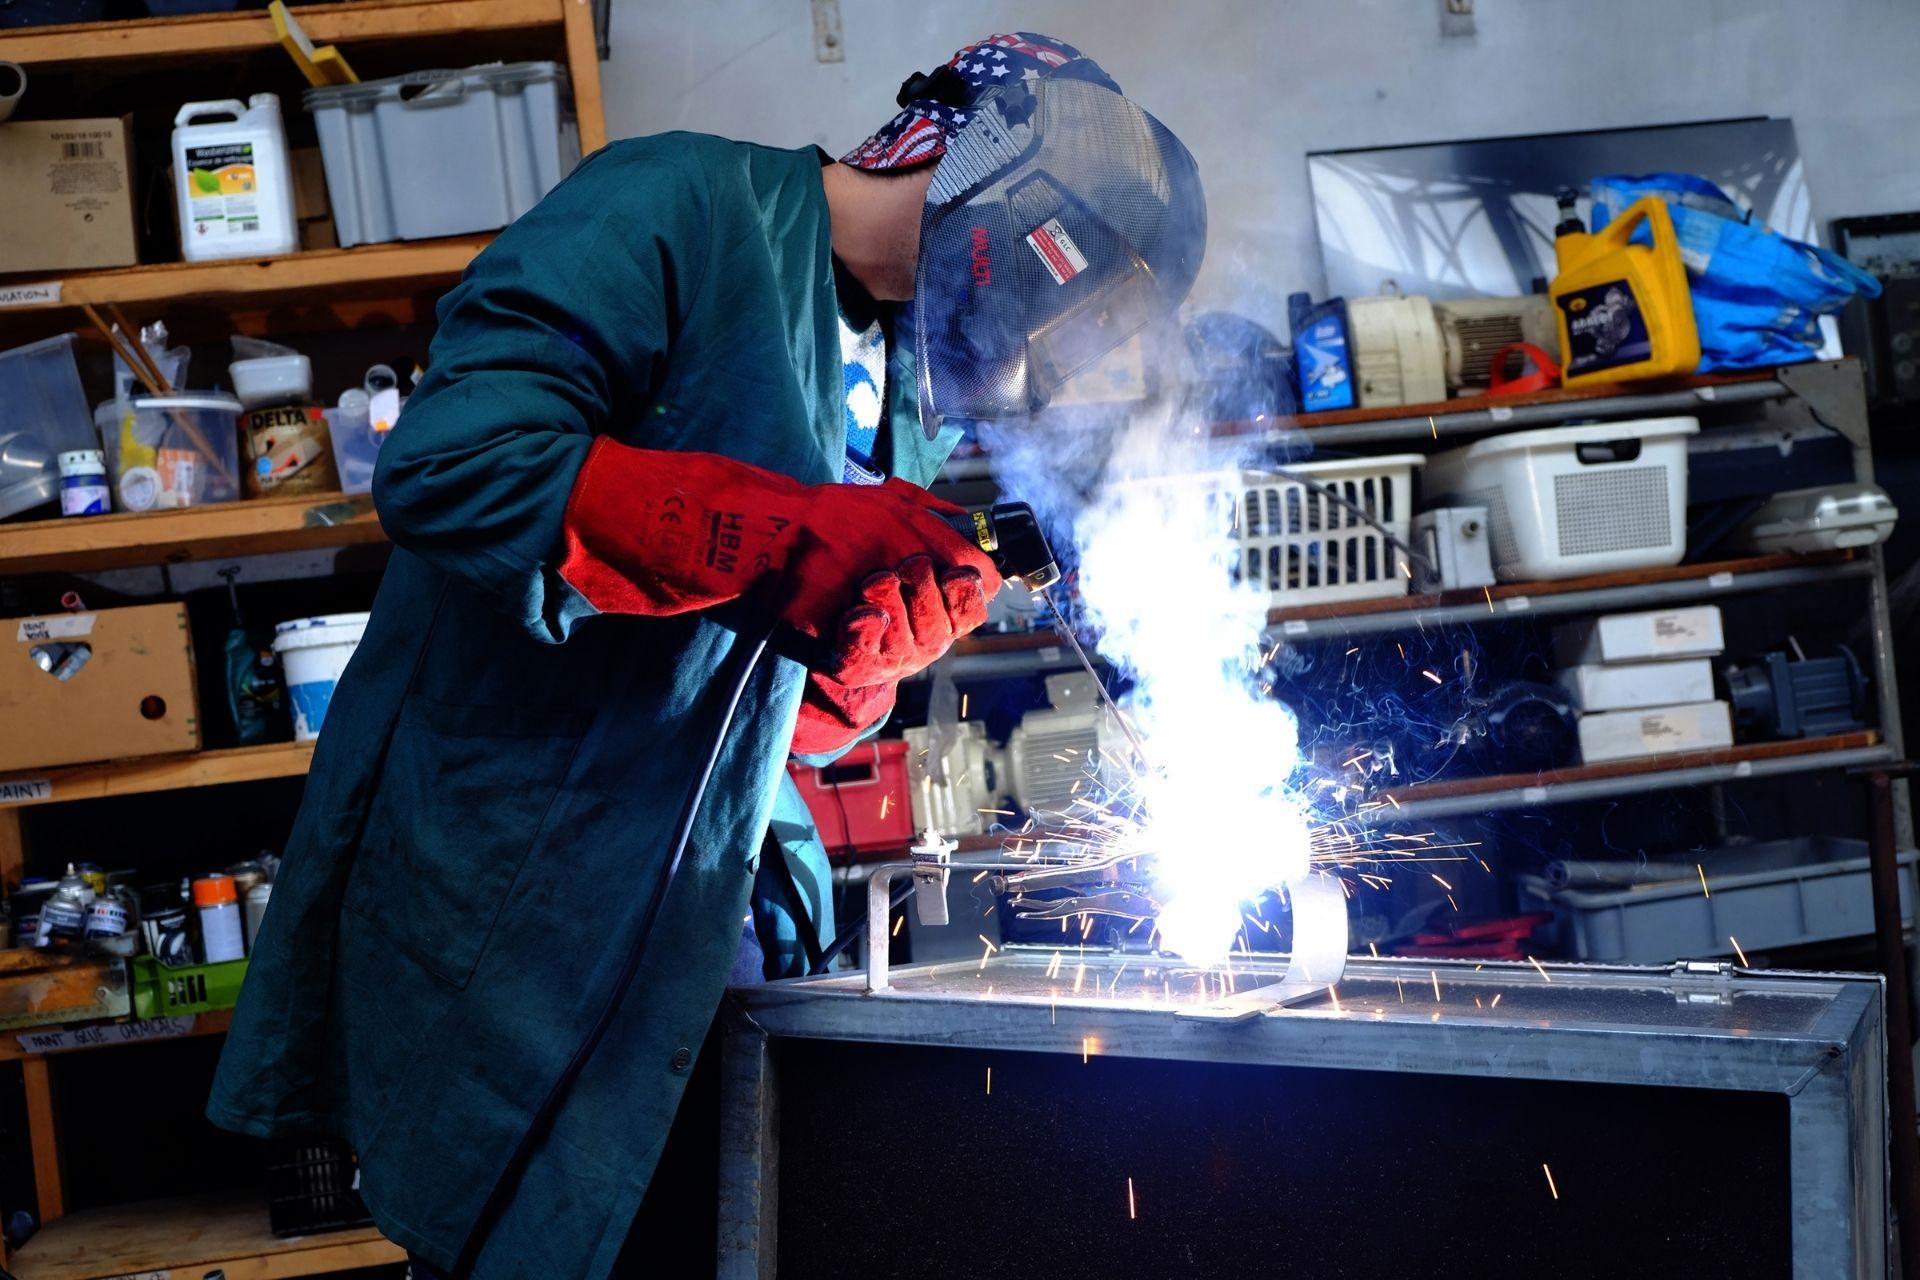 man welding in the precious plastic workspace